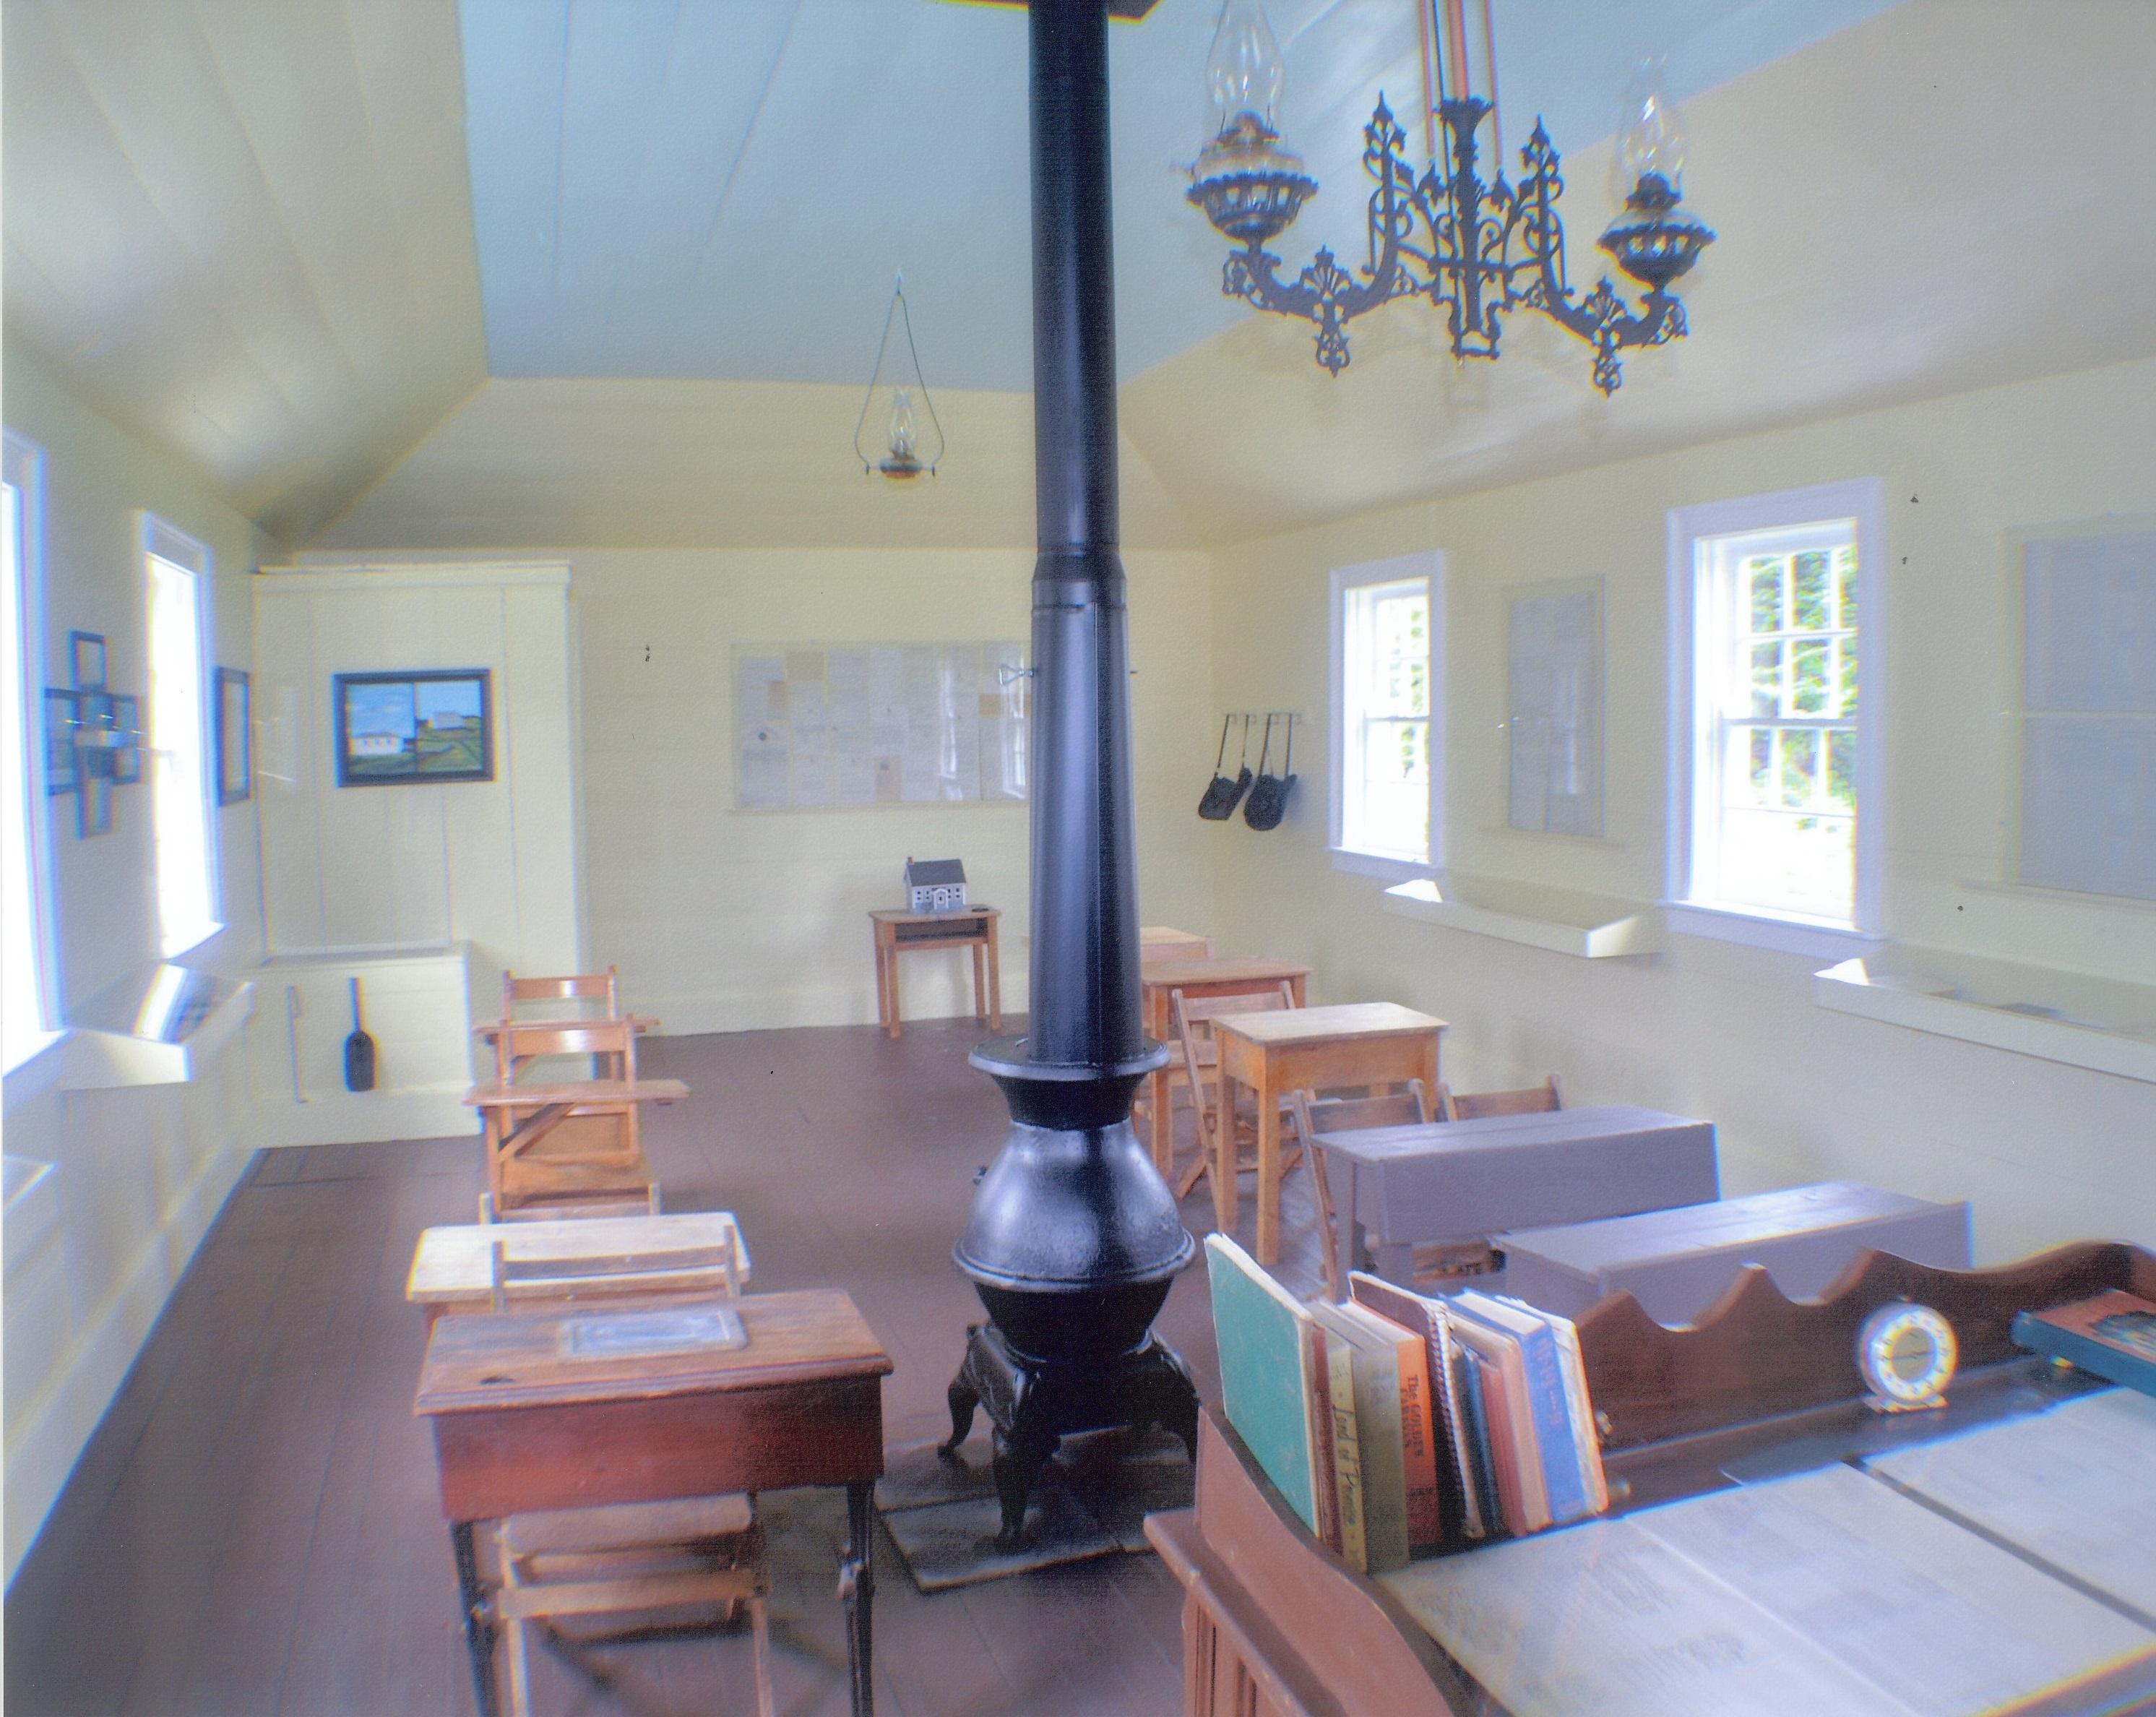 Bristol's Hope Schoolhouse - Interior